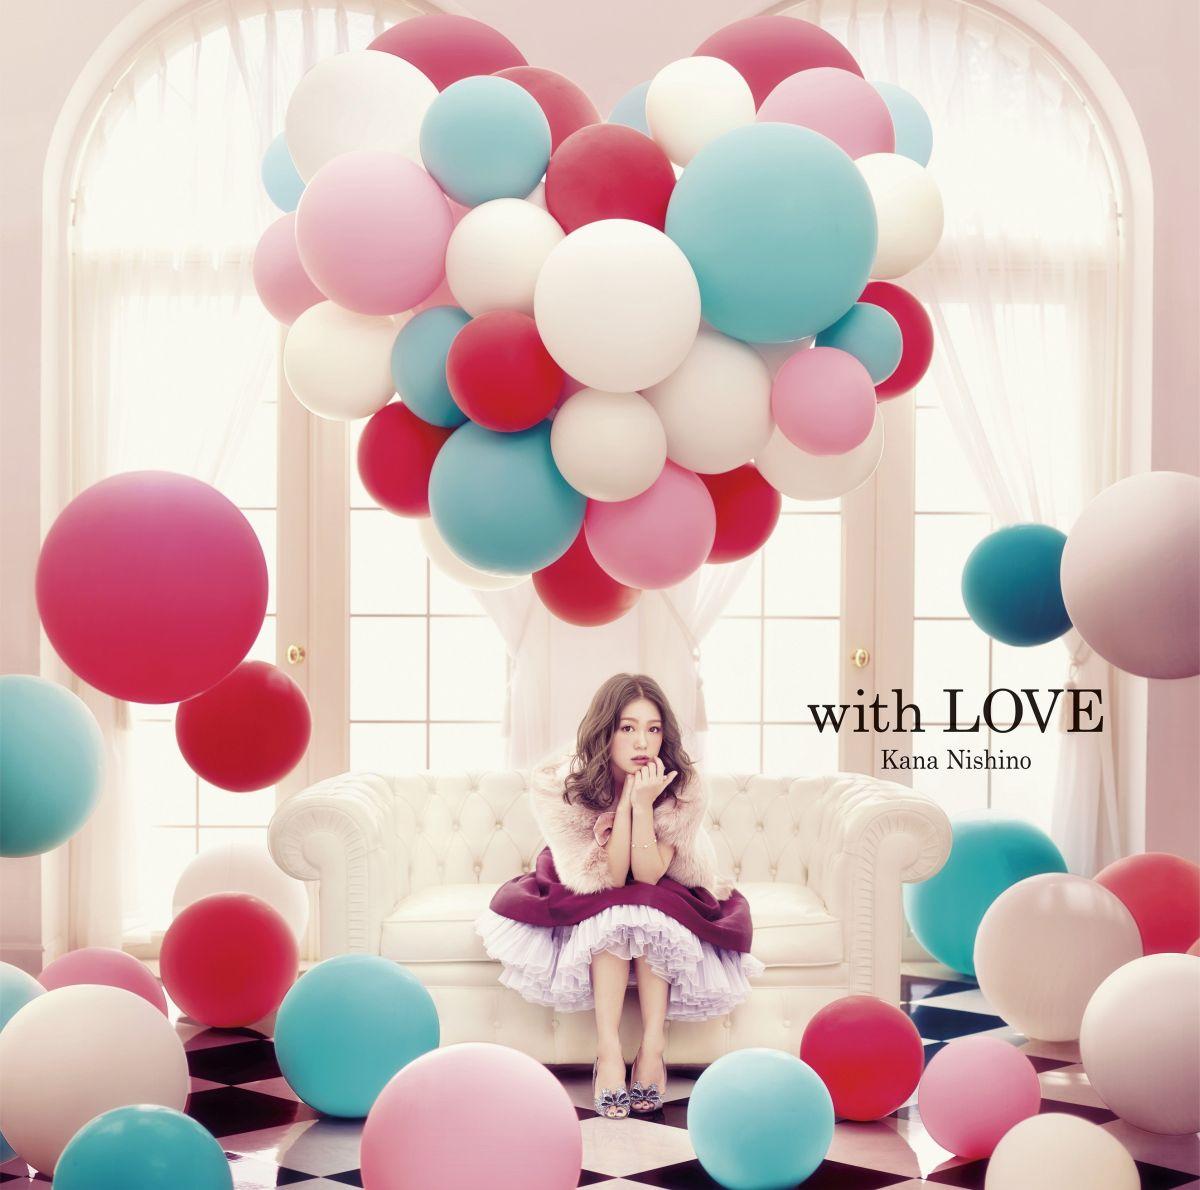 with LOVE [ 西野カナ ]